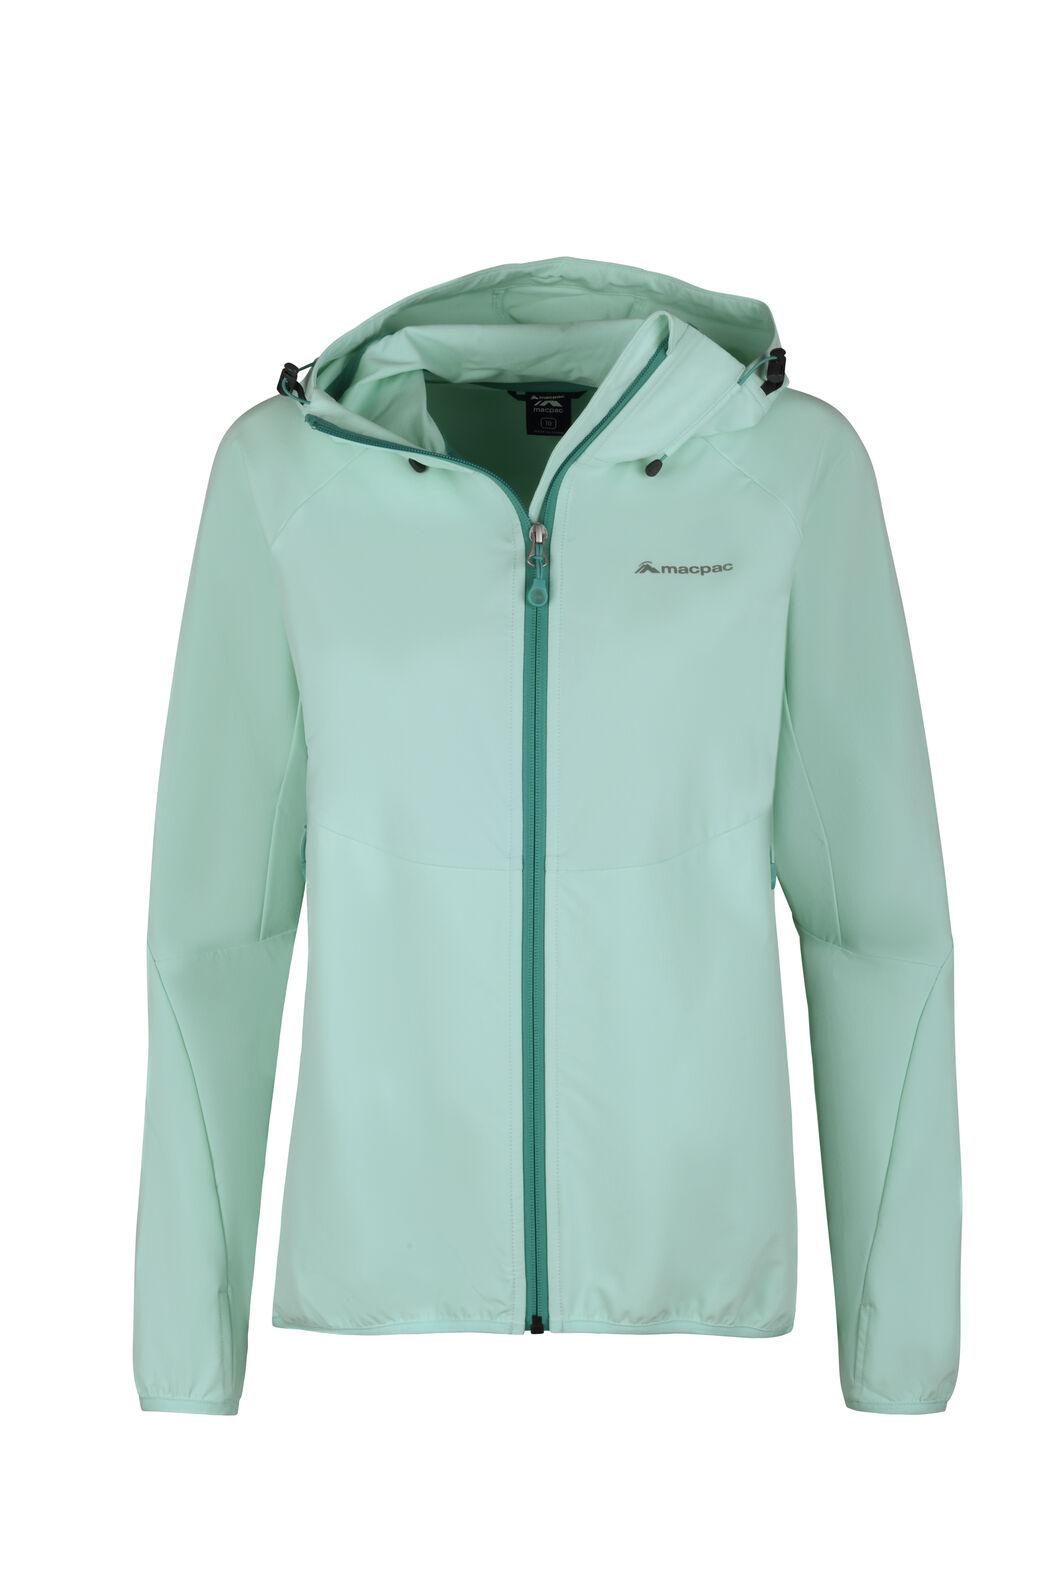 Macpac Mannering Hooded Jacket - Women's, Beach Glass, hi-res